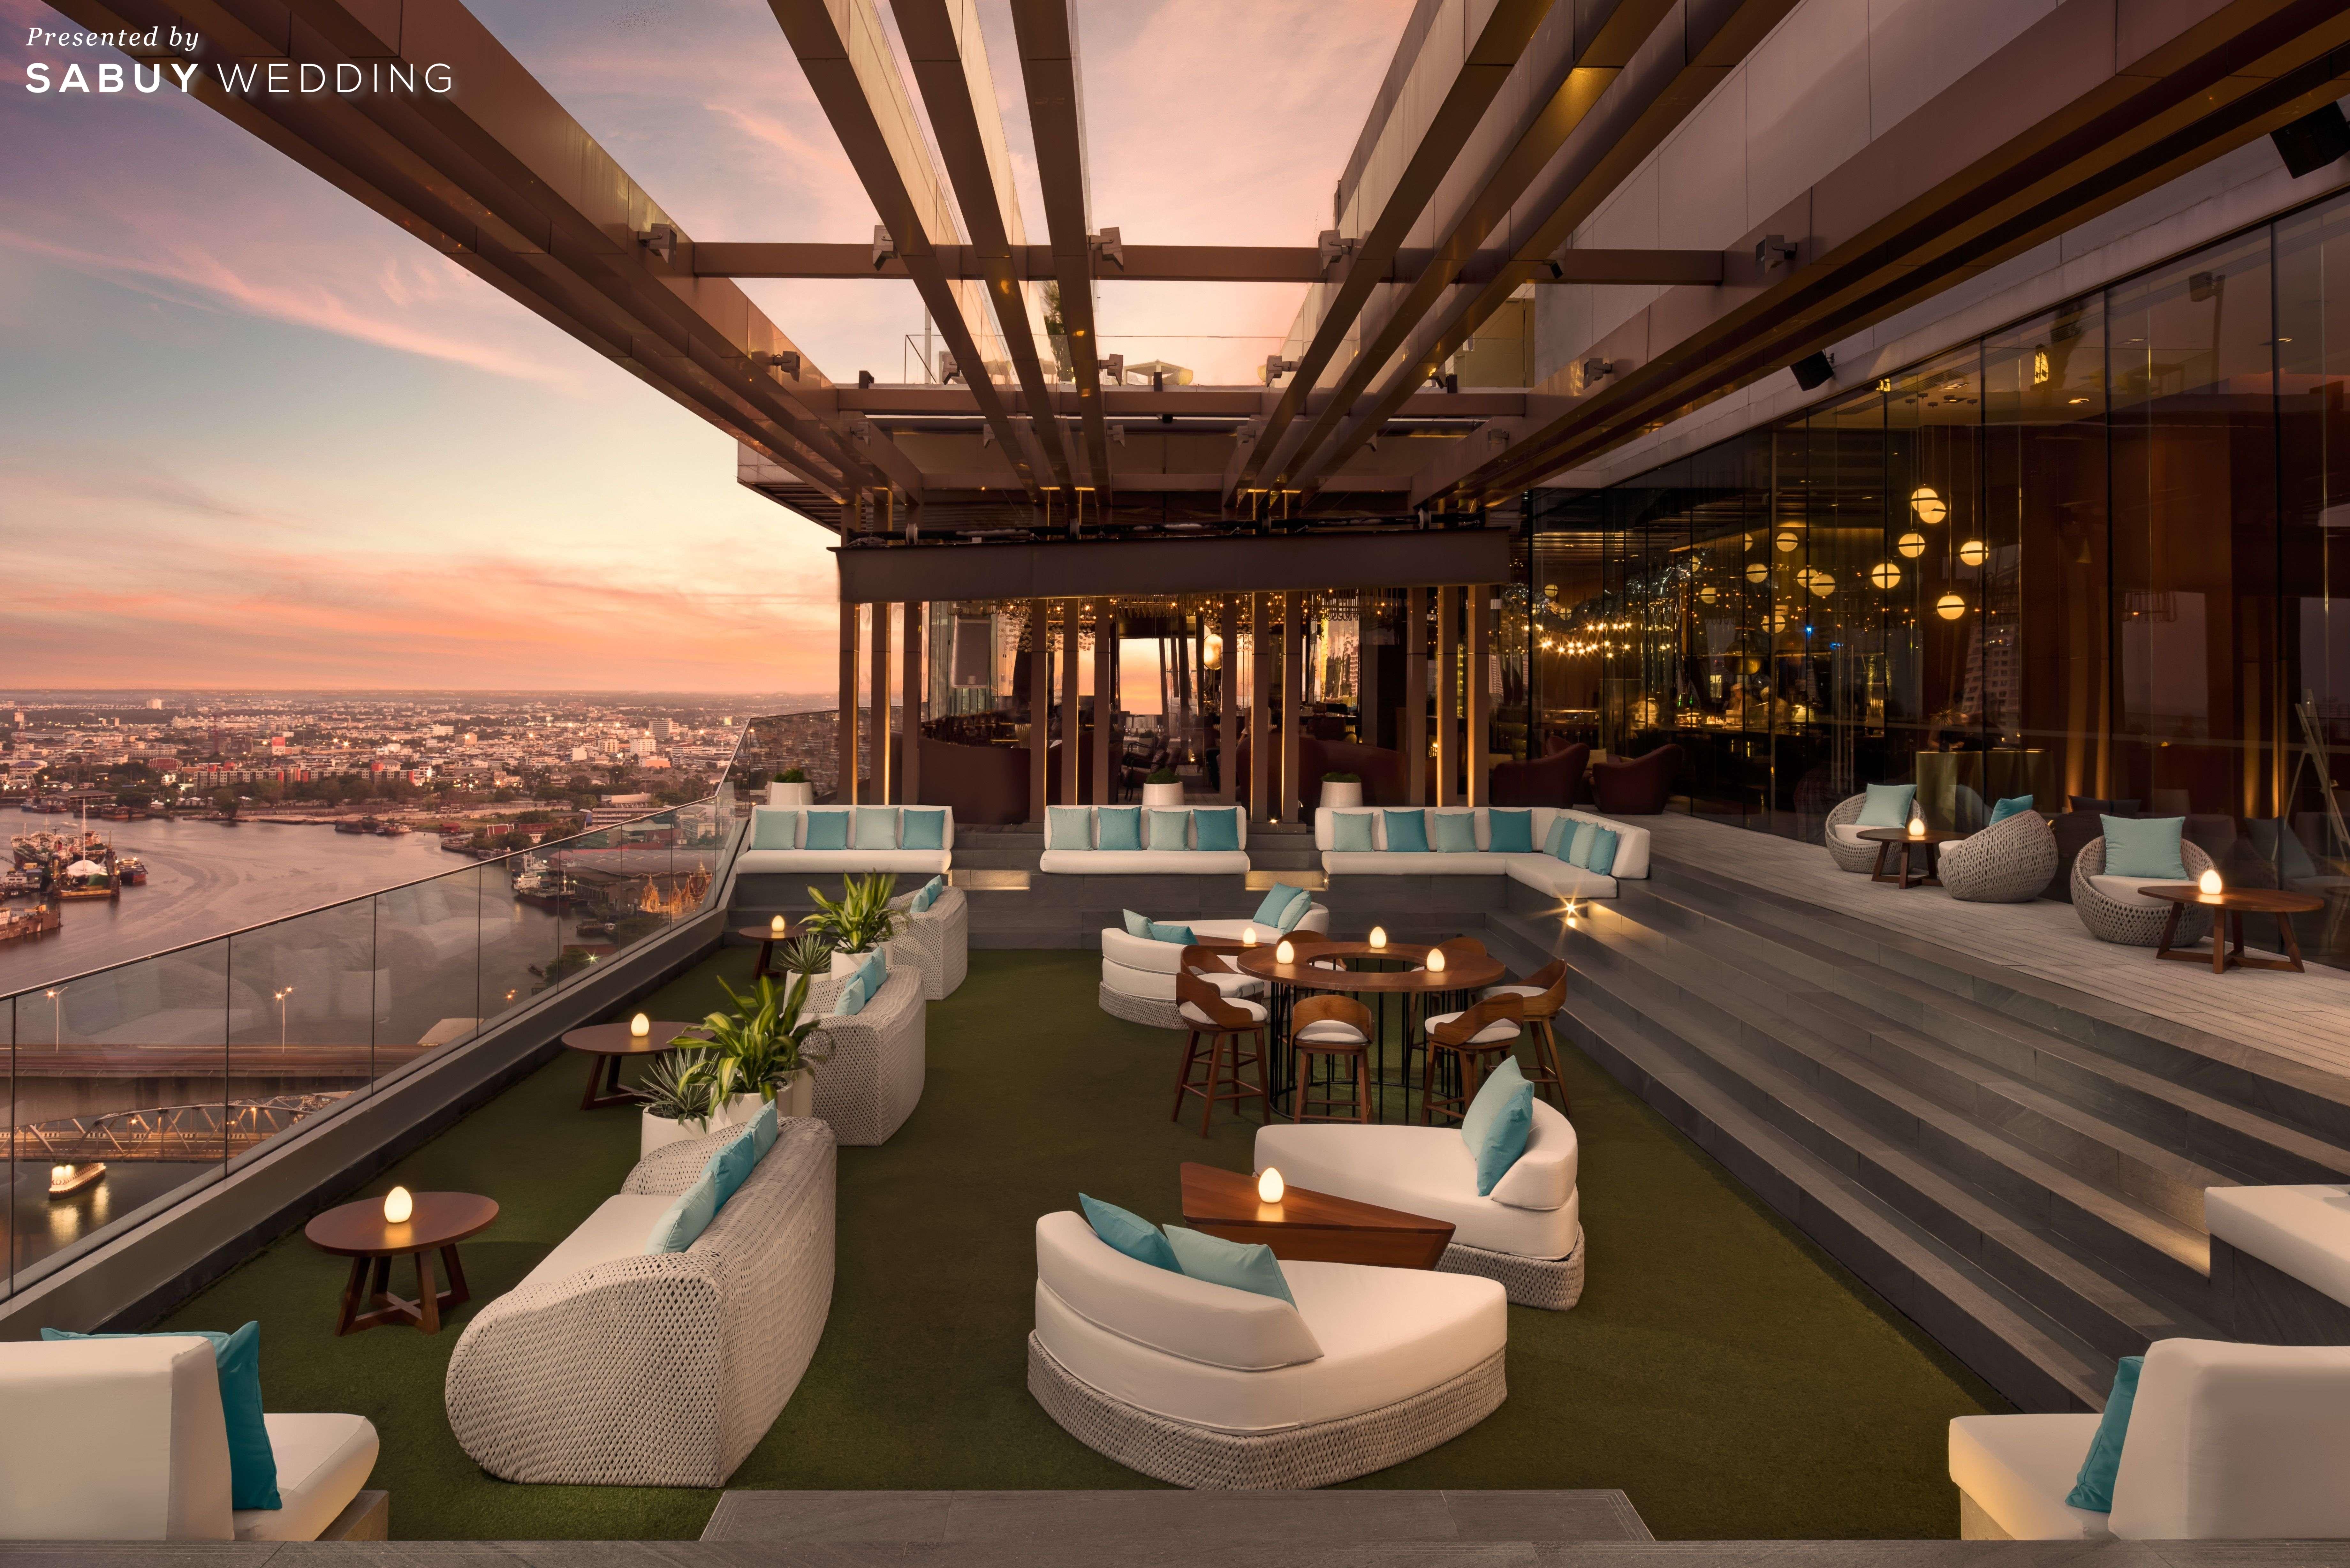 AVANI+ Riverside Bangkok Hotel อลังการห้องจัดเลี้ยงไซส์ใหญ่ เพดานสูง 11 เมตร!